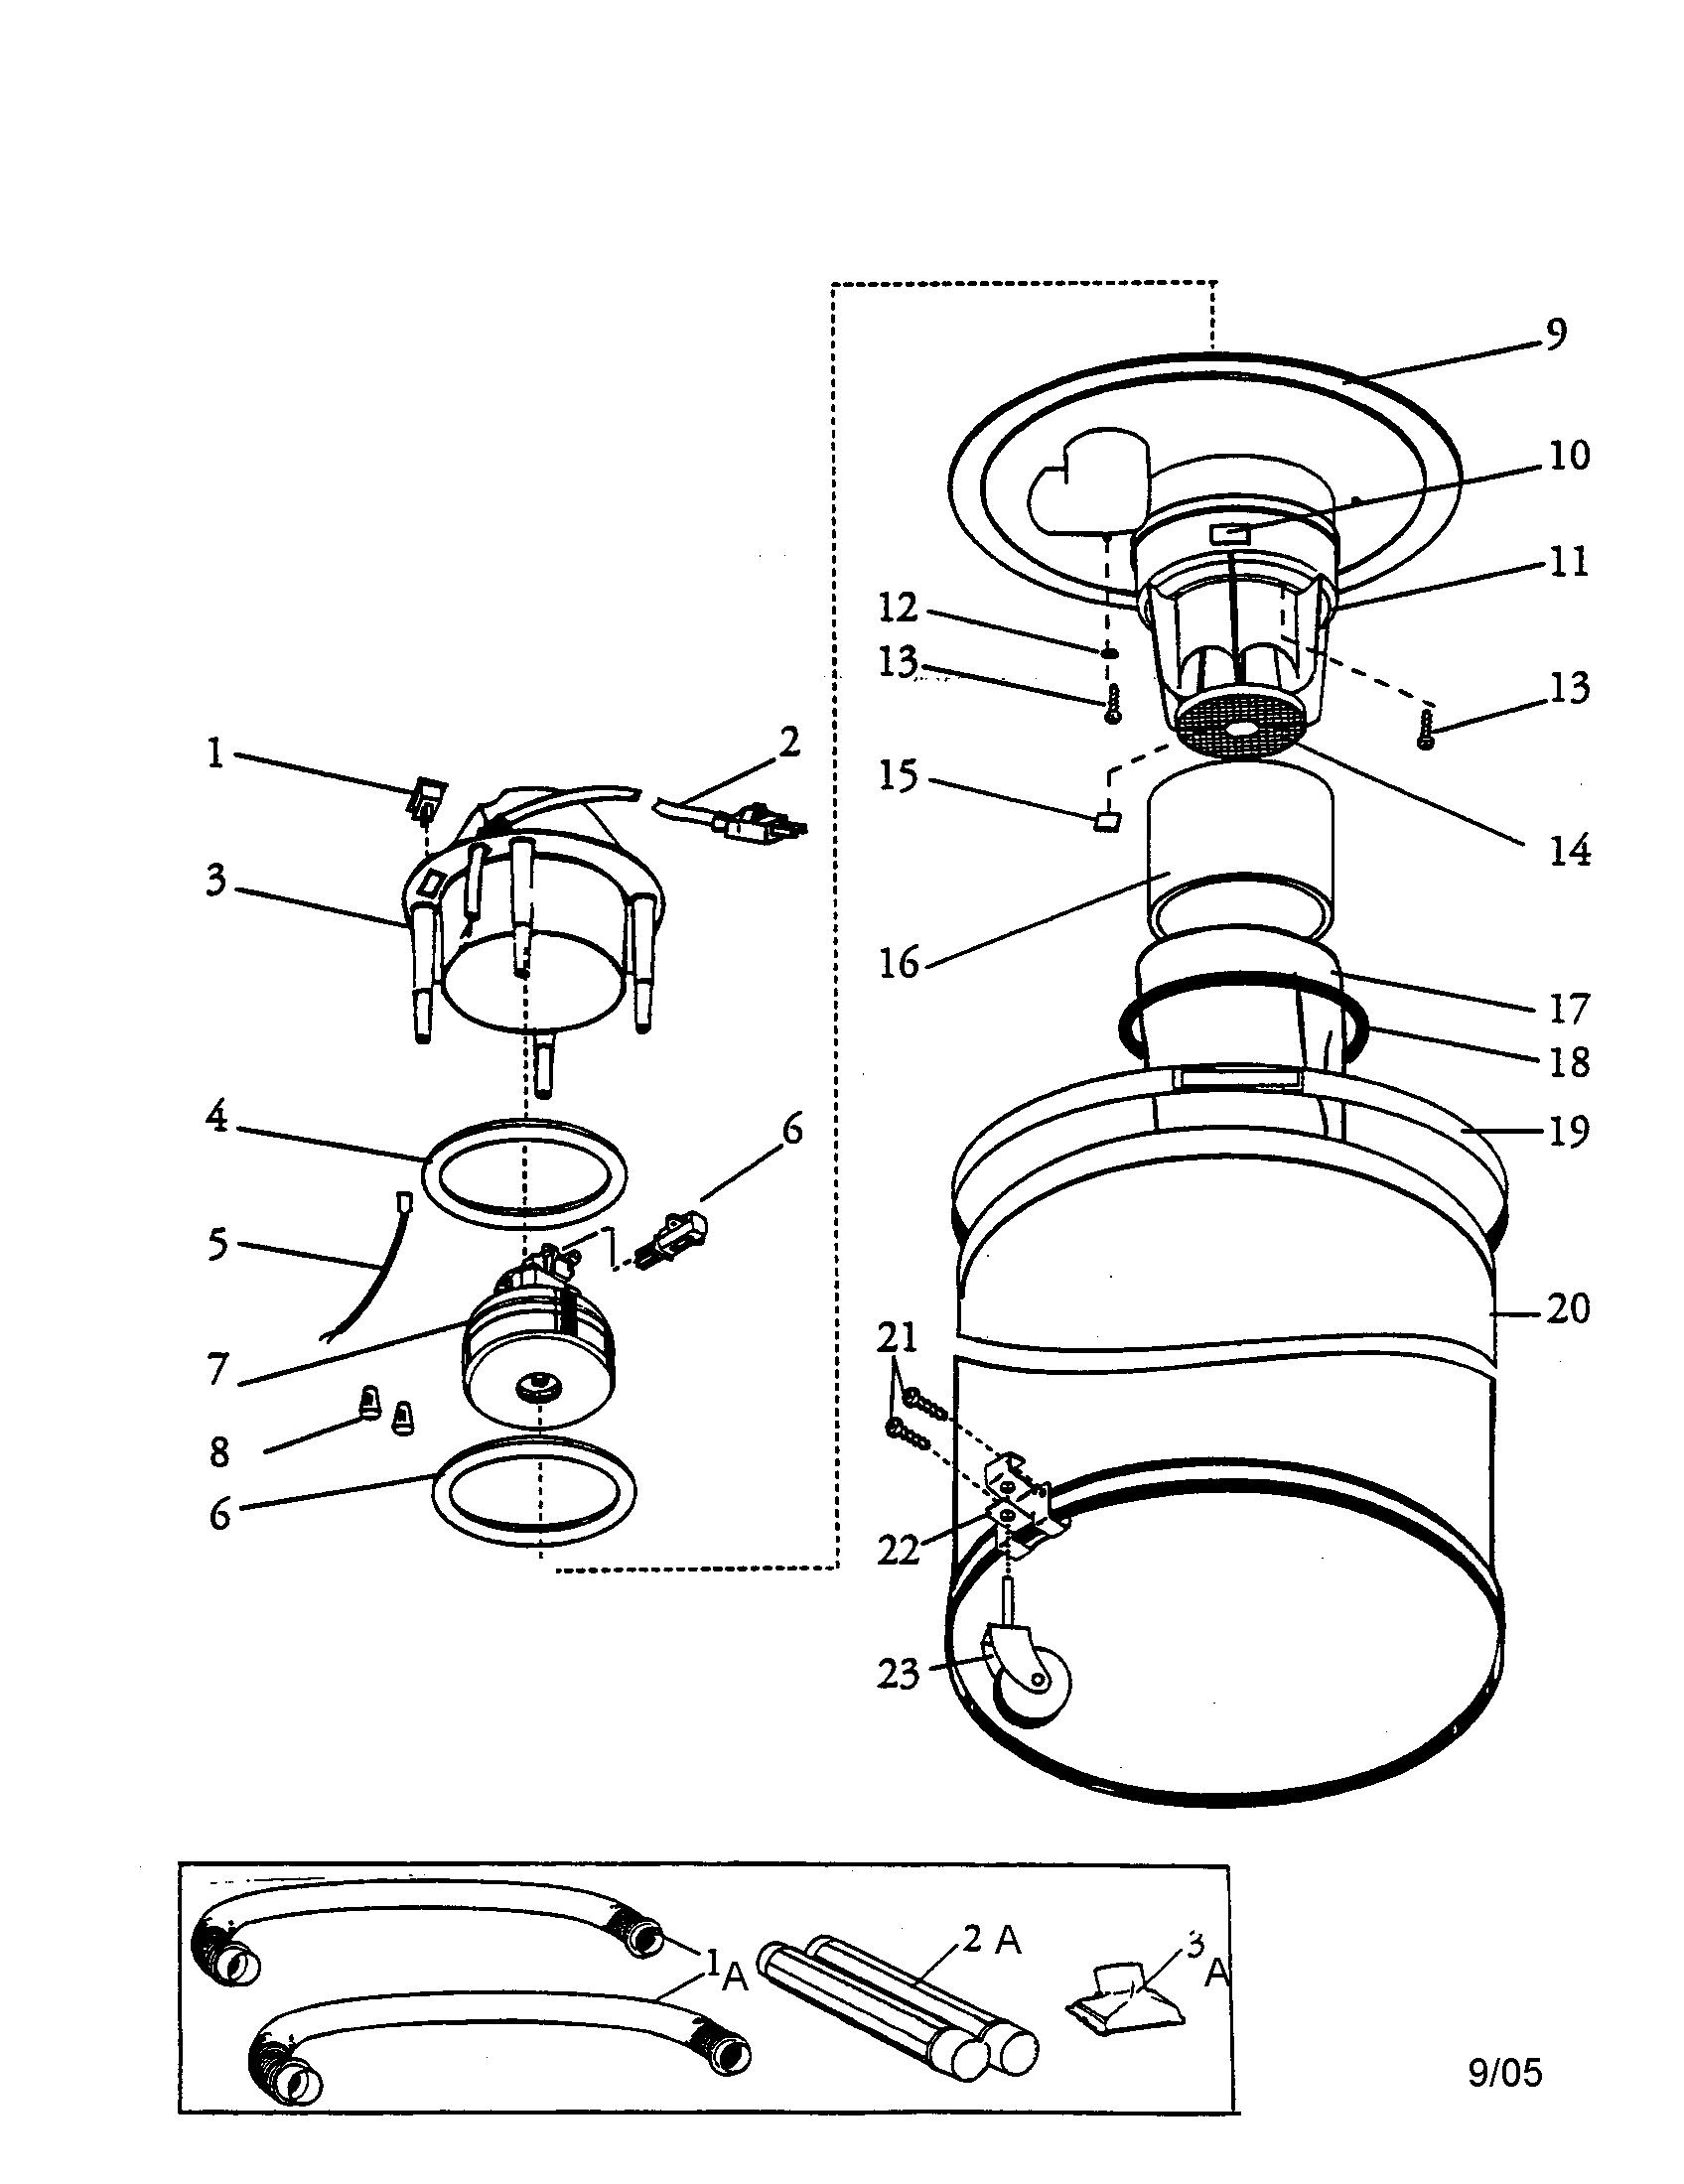 hight resolution of shop vac model 2010 wiring diagram